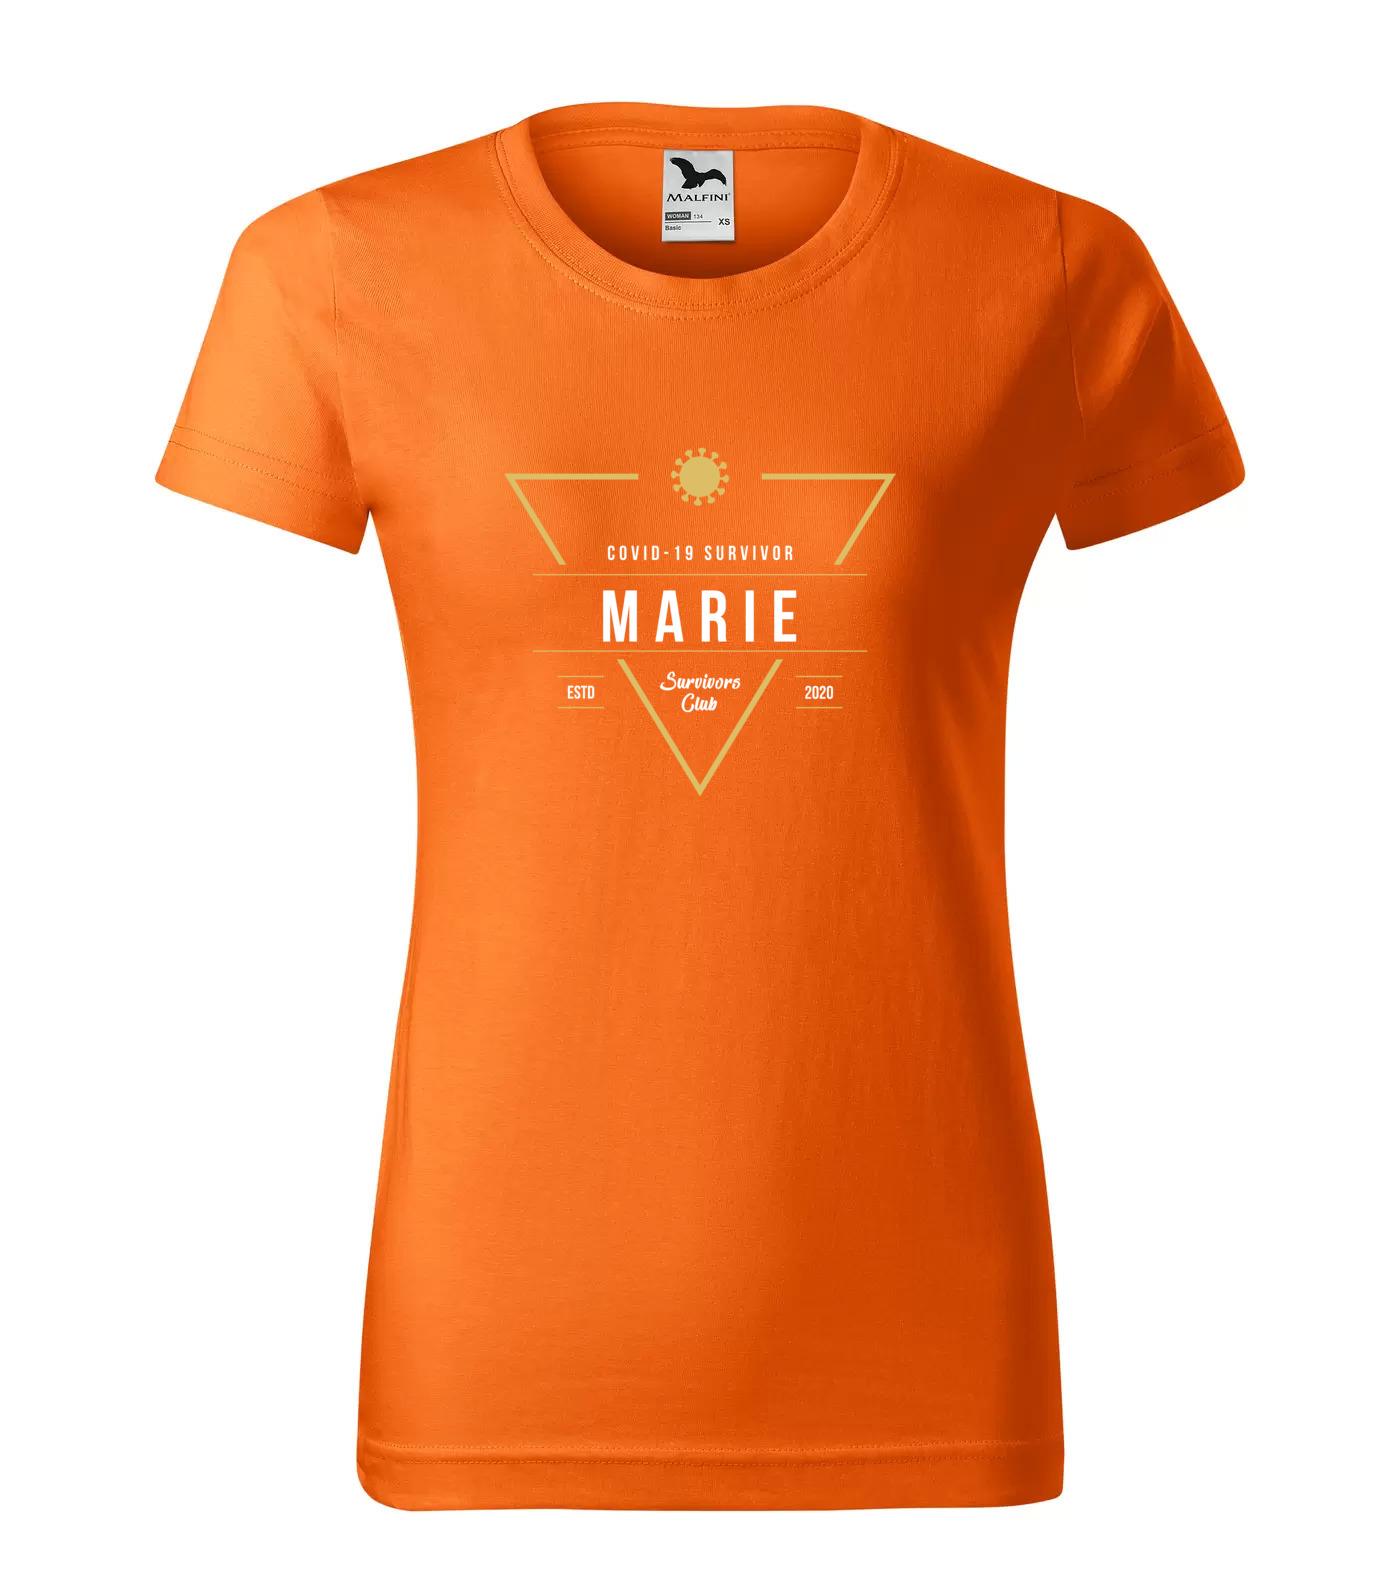 Tričko Survivor Club Marie